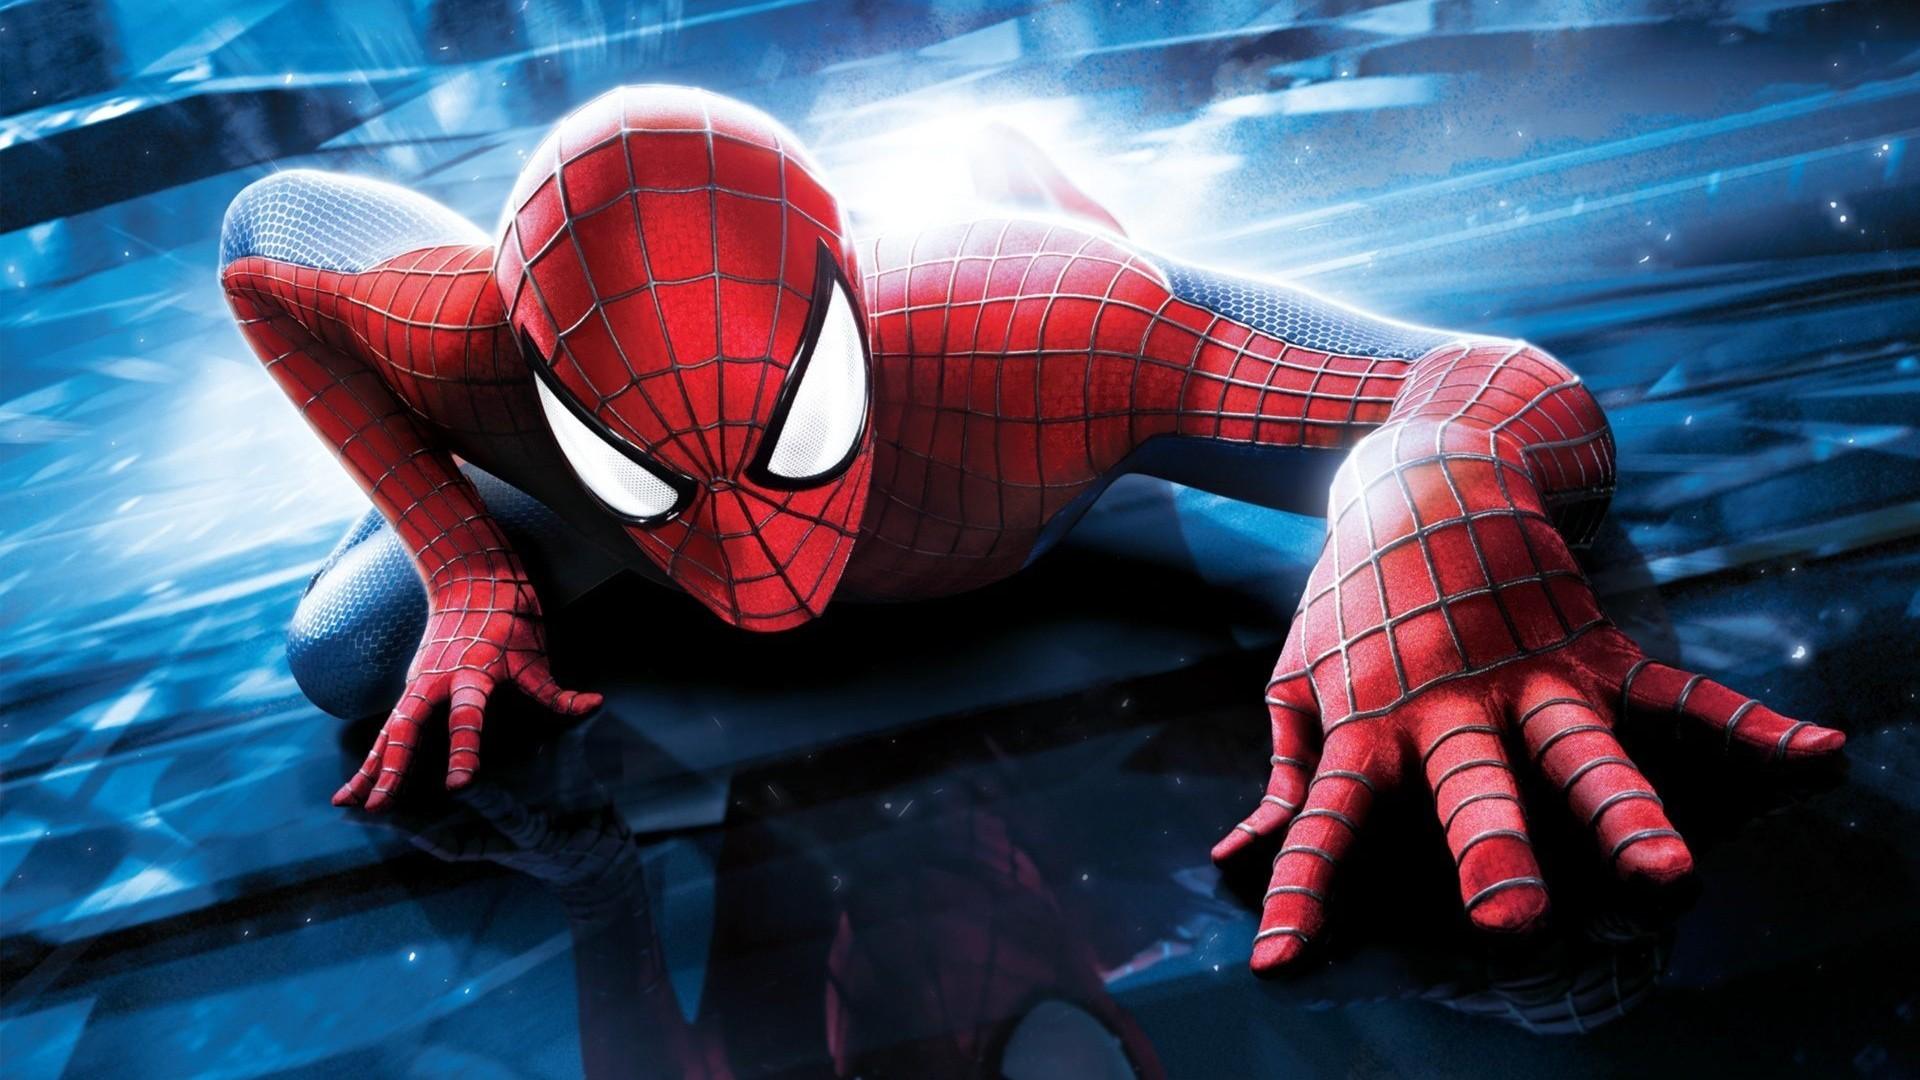 Spiderman Homecoming 4K HD Desktop Wallpaper for 4K Ultra